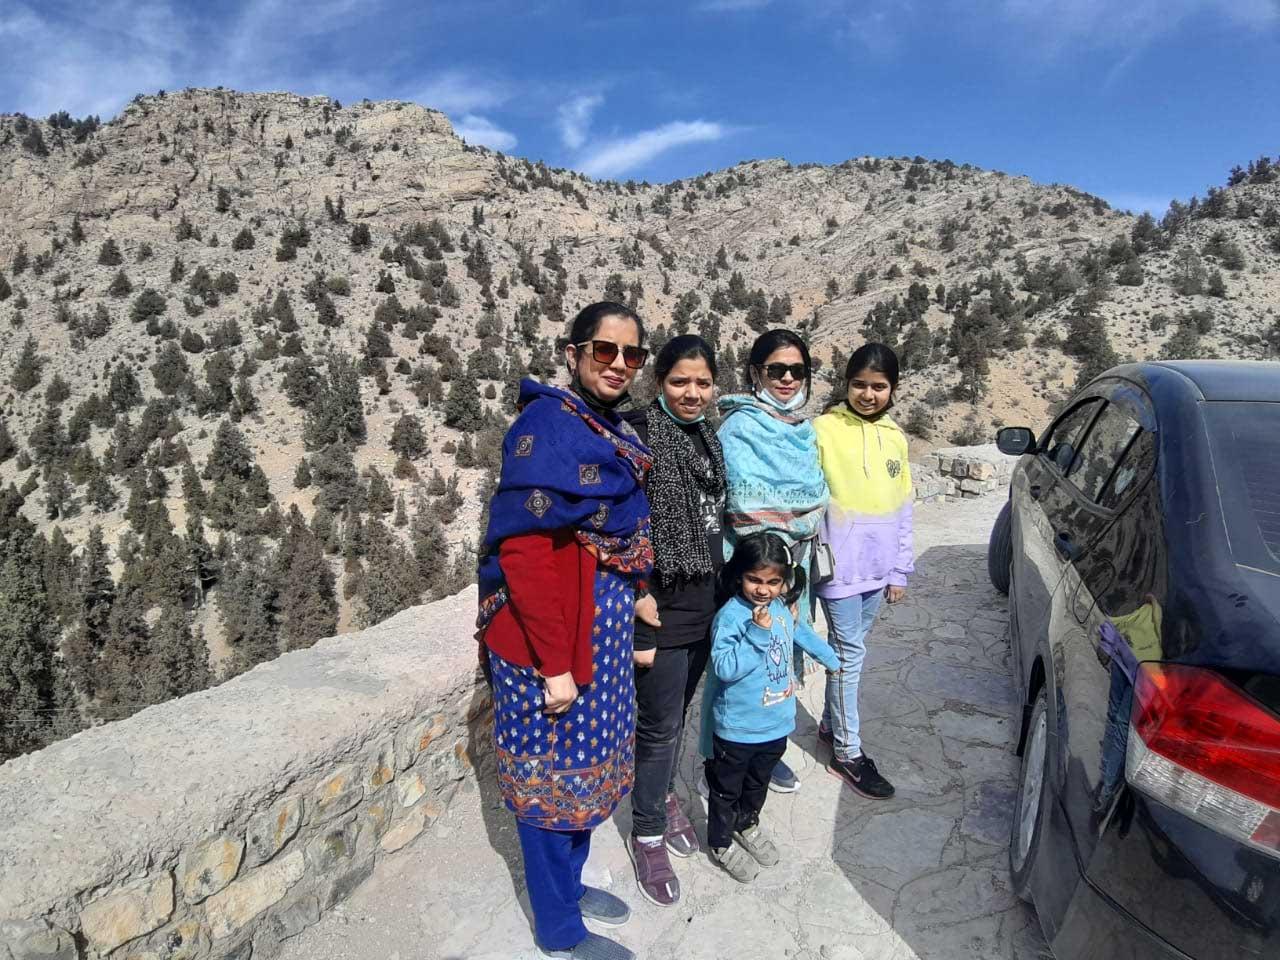 Erum, Zoya, Ayesha, Farhat and Zara on top of the mountain.